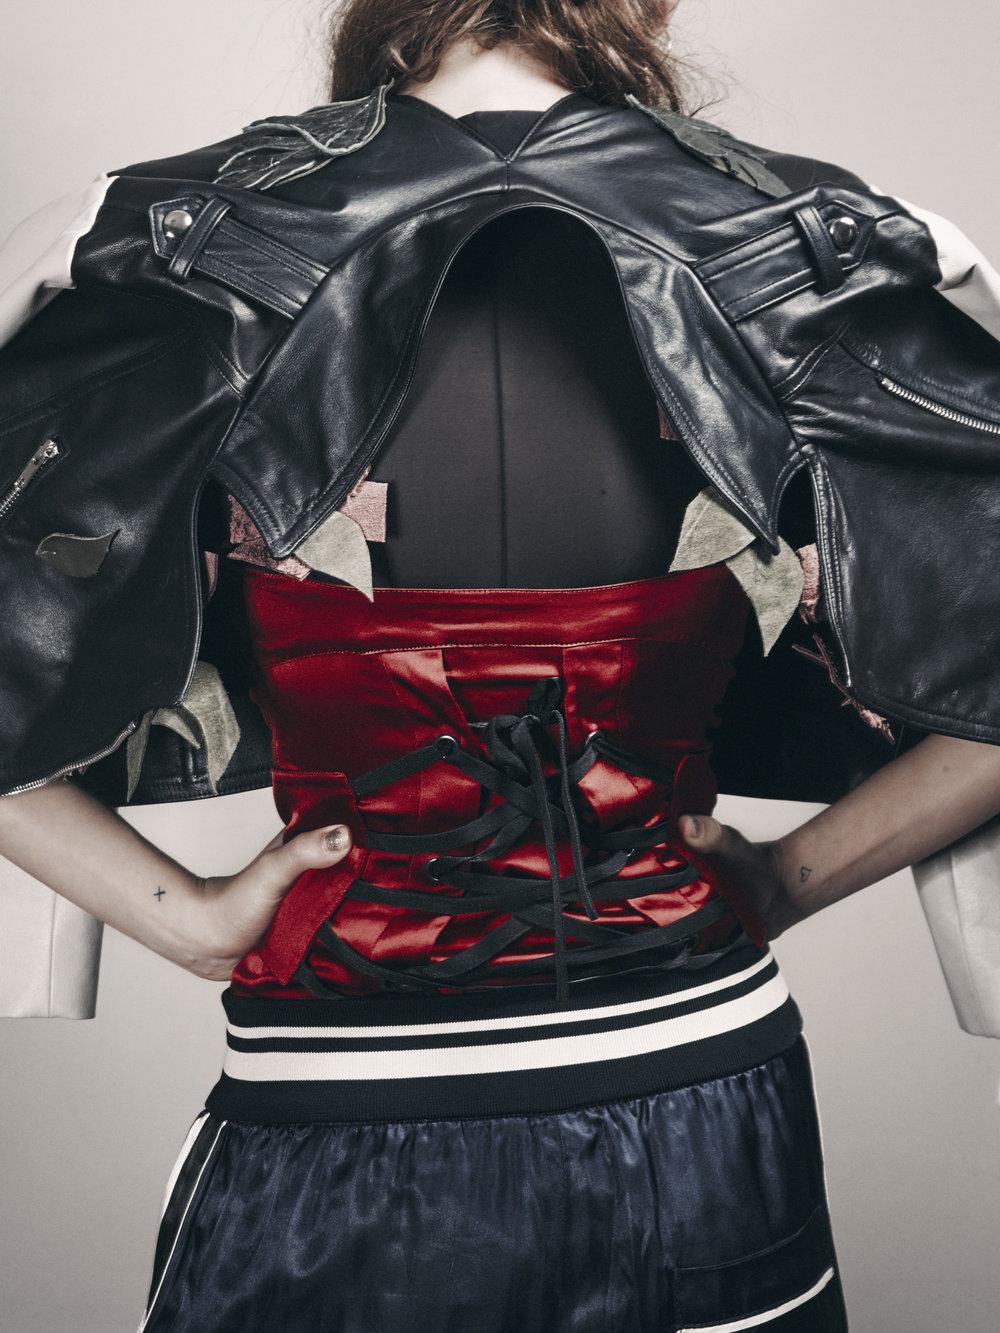 ARMATURE split back leather jacket,DSTM shear t-shirt, Murmur corset